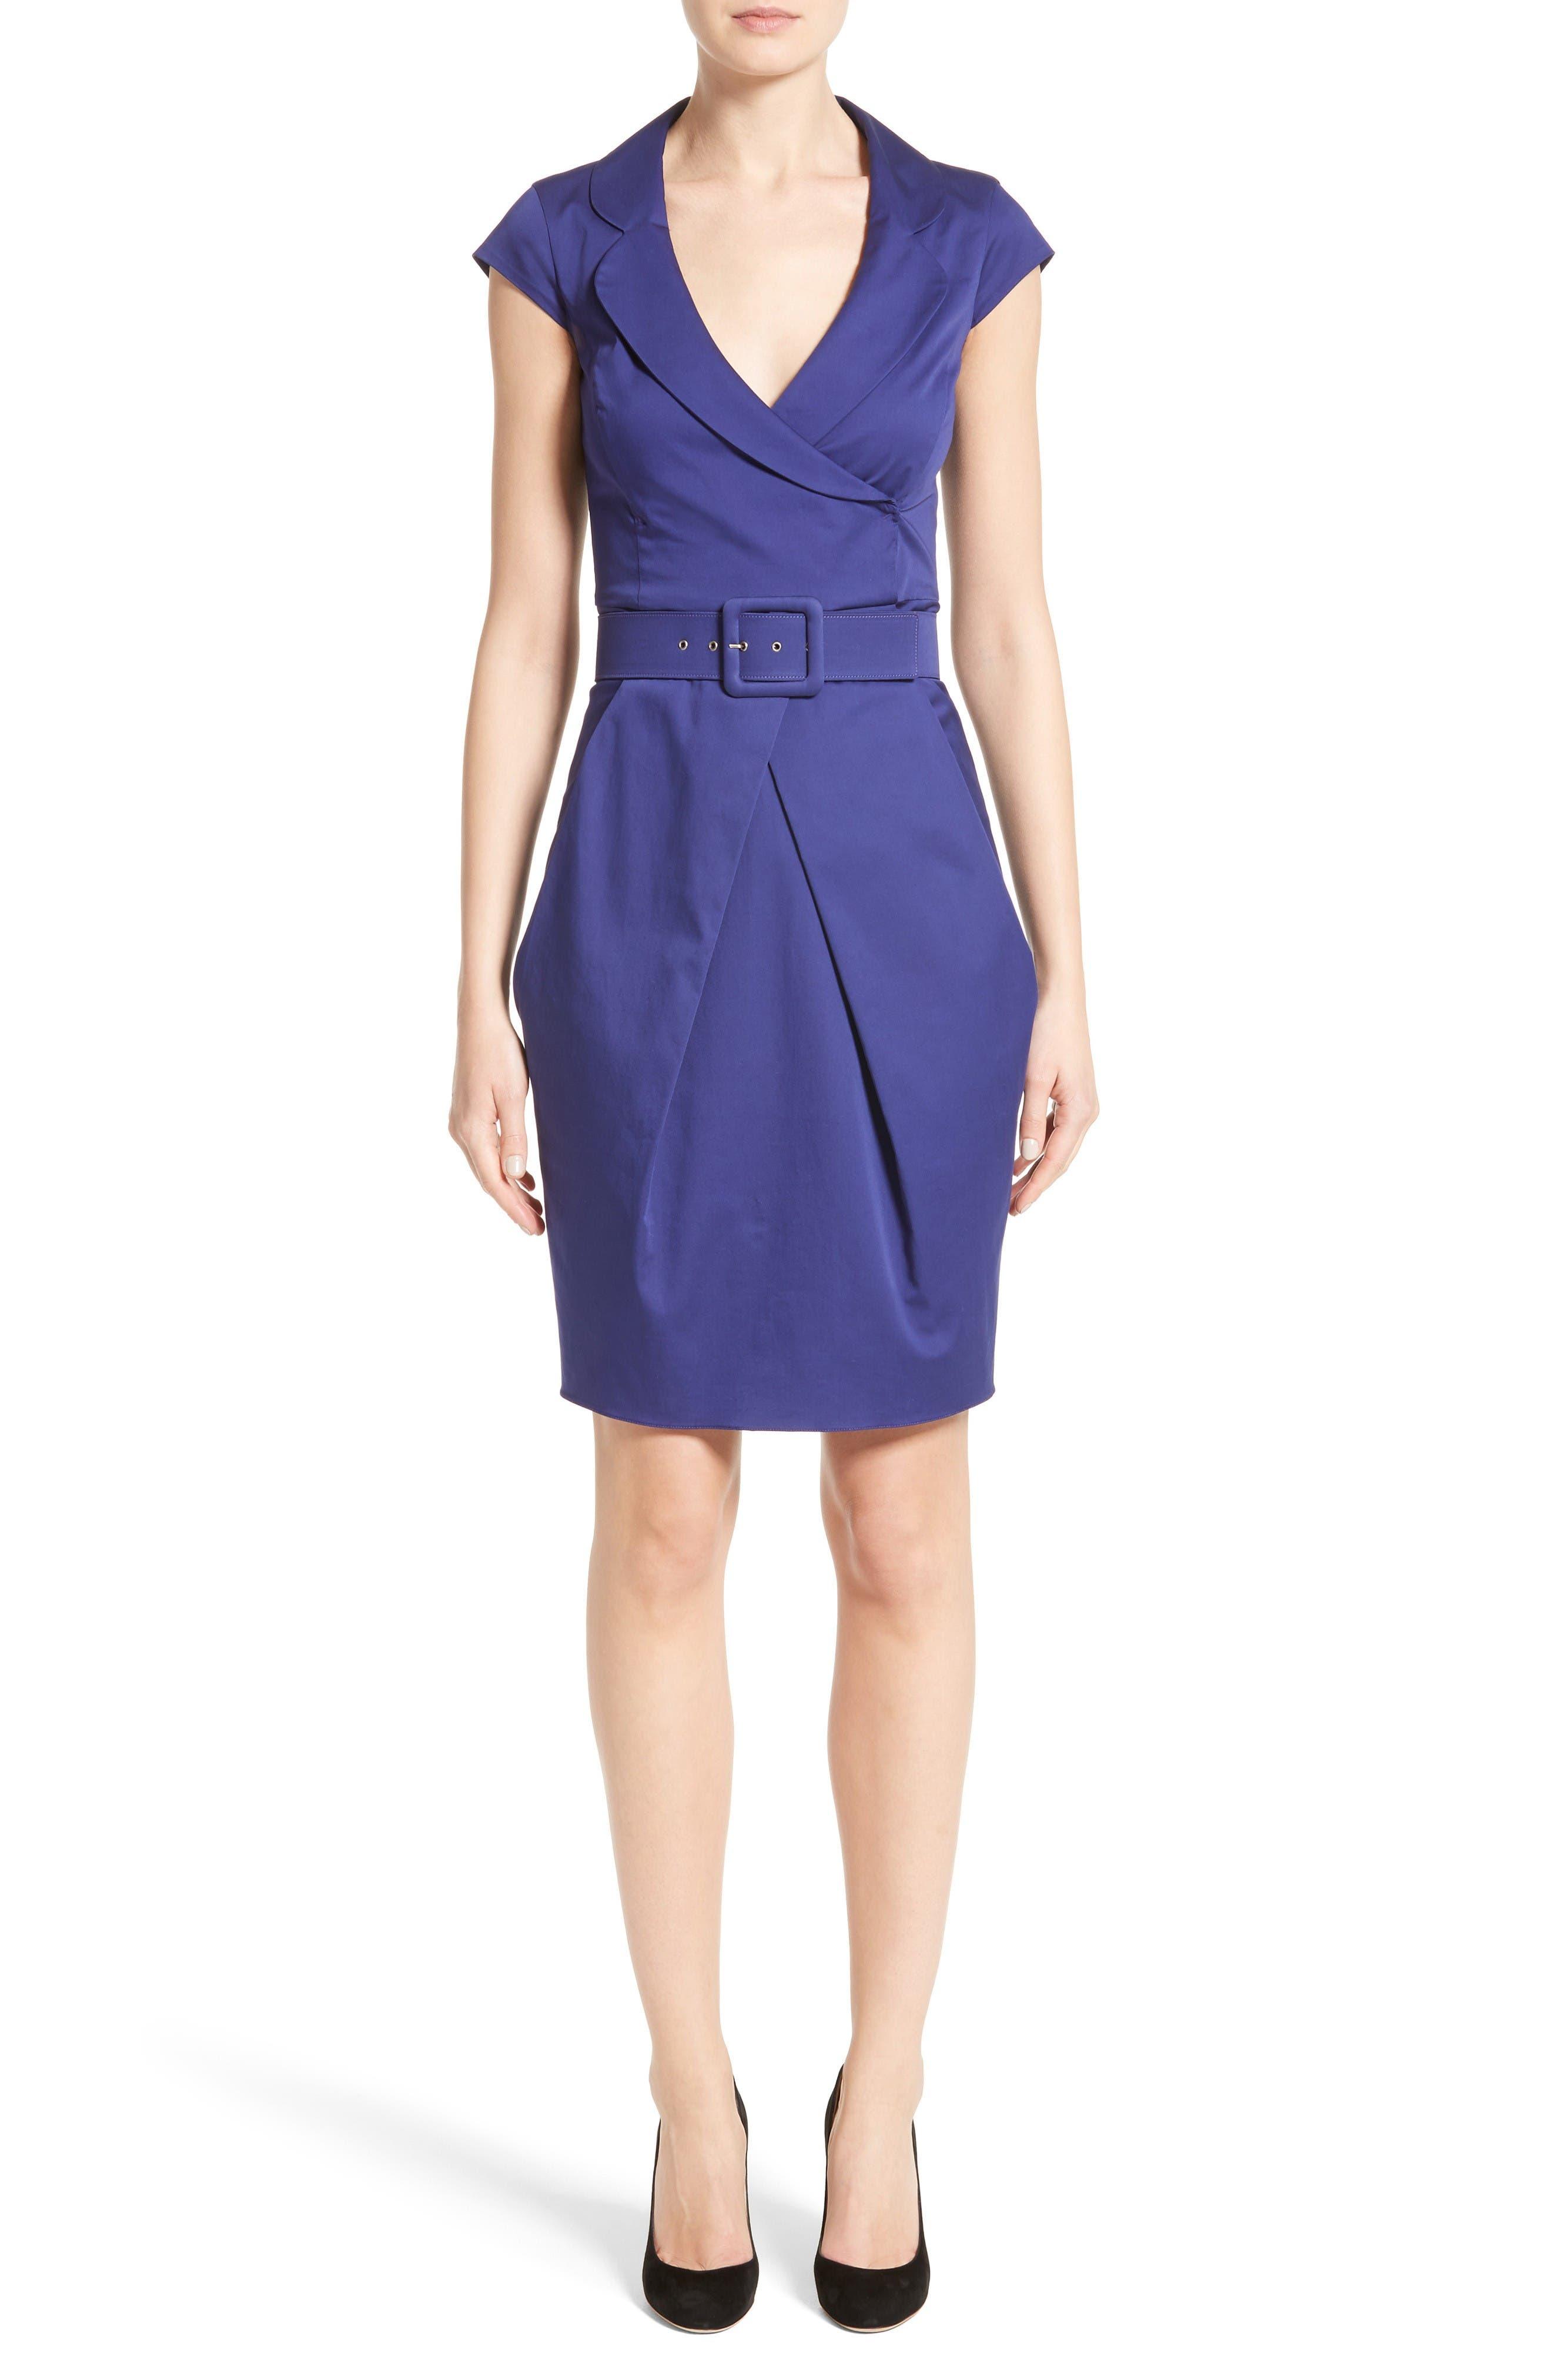 Alternate Image 1 Selected - Armani Collezioni Belted Sheath Dress